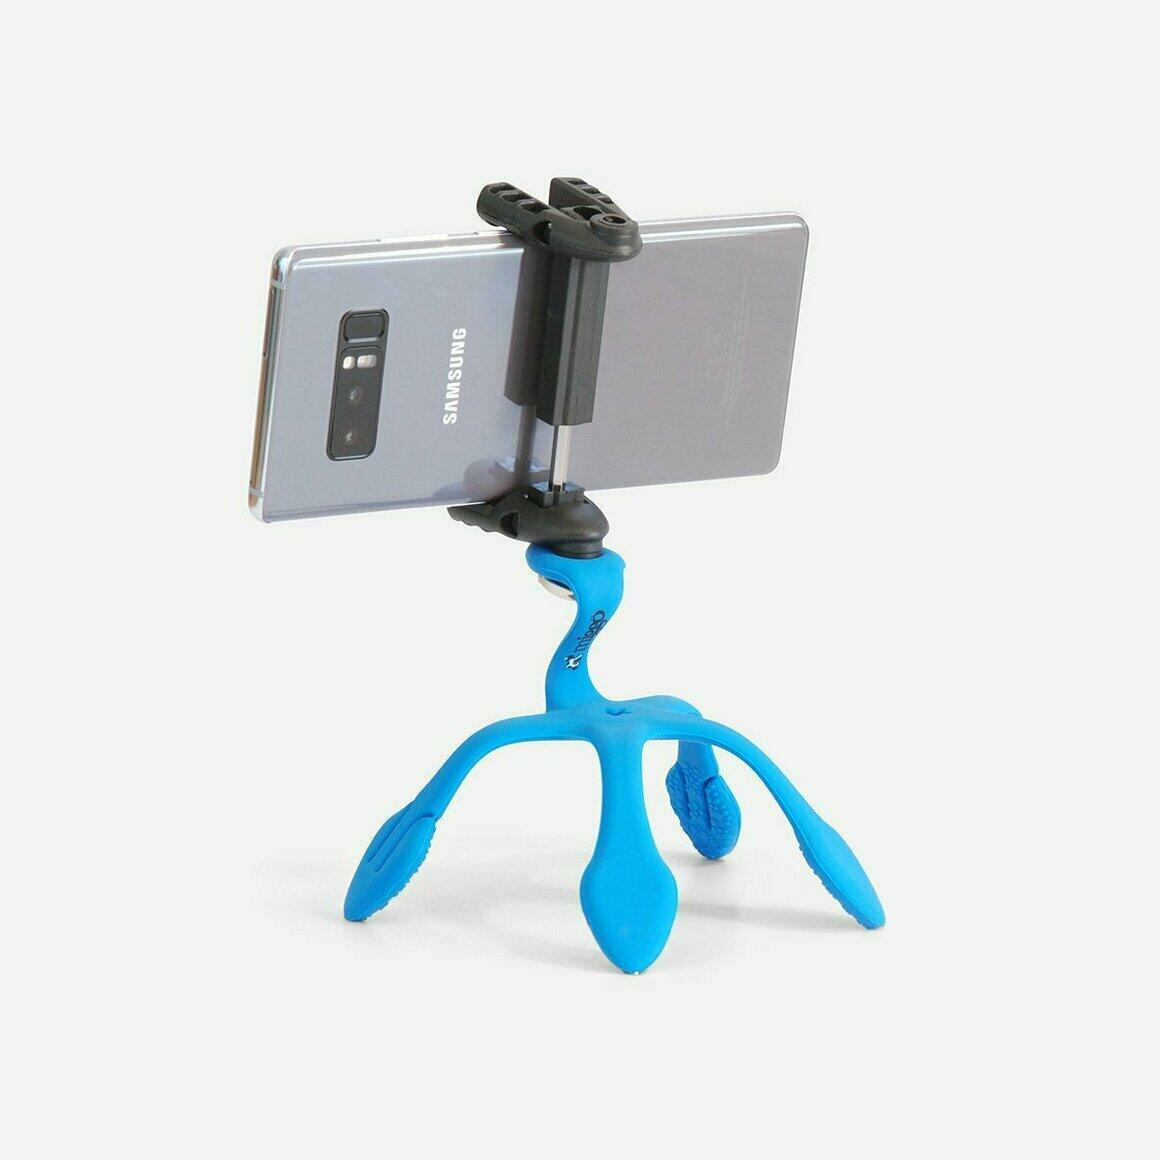 Splat Flexible Tripod 3N1 Blue   Trada Marketplace